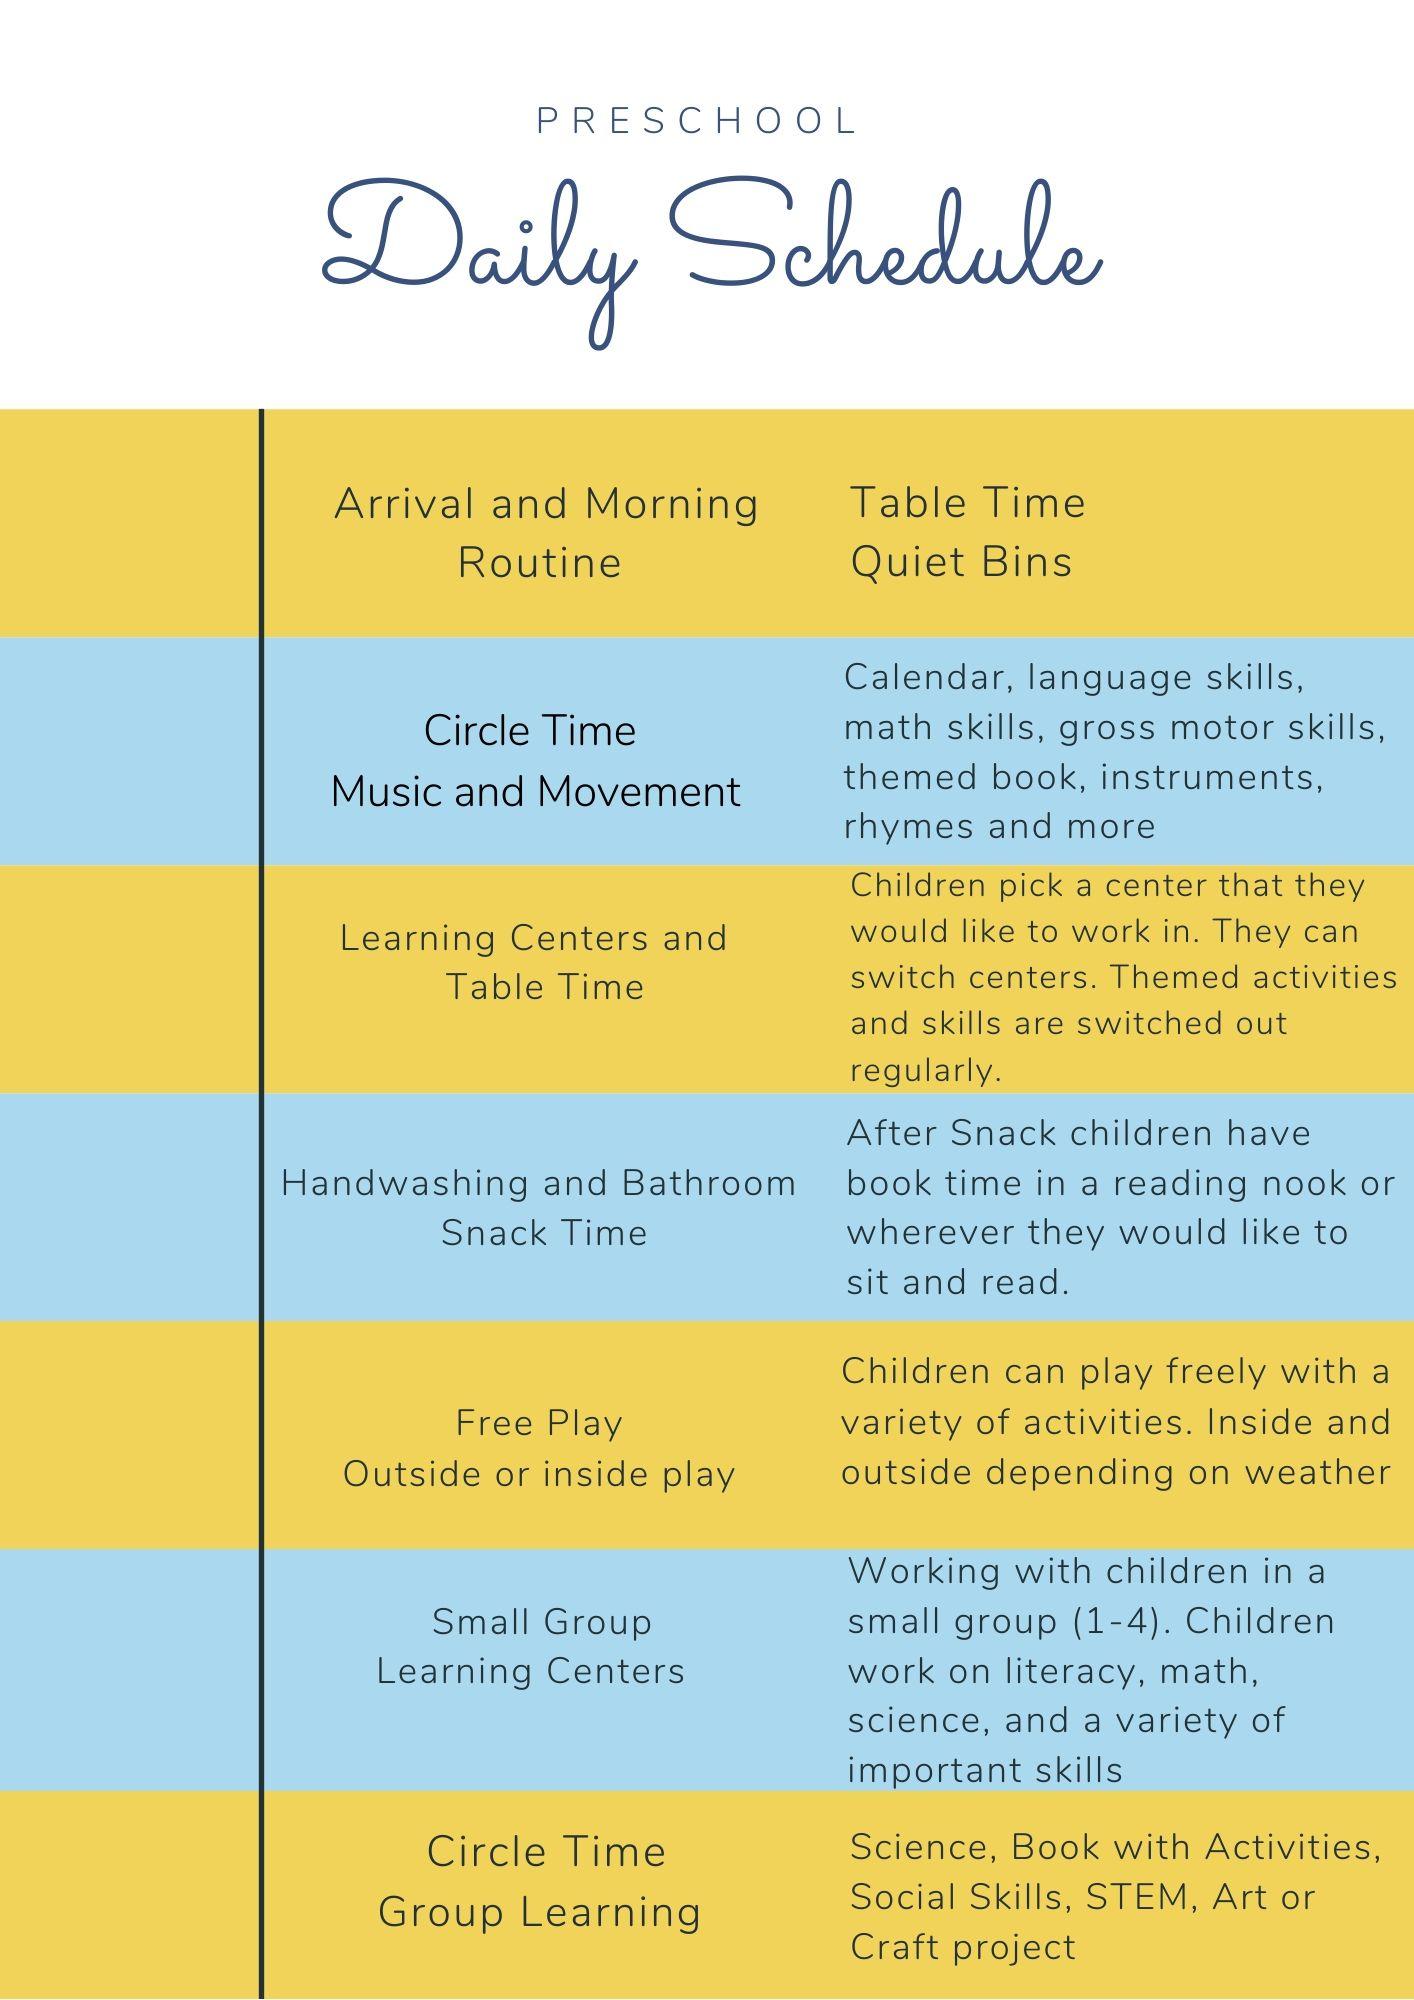 Preschool Daily Schedule Ideas